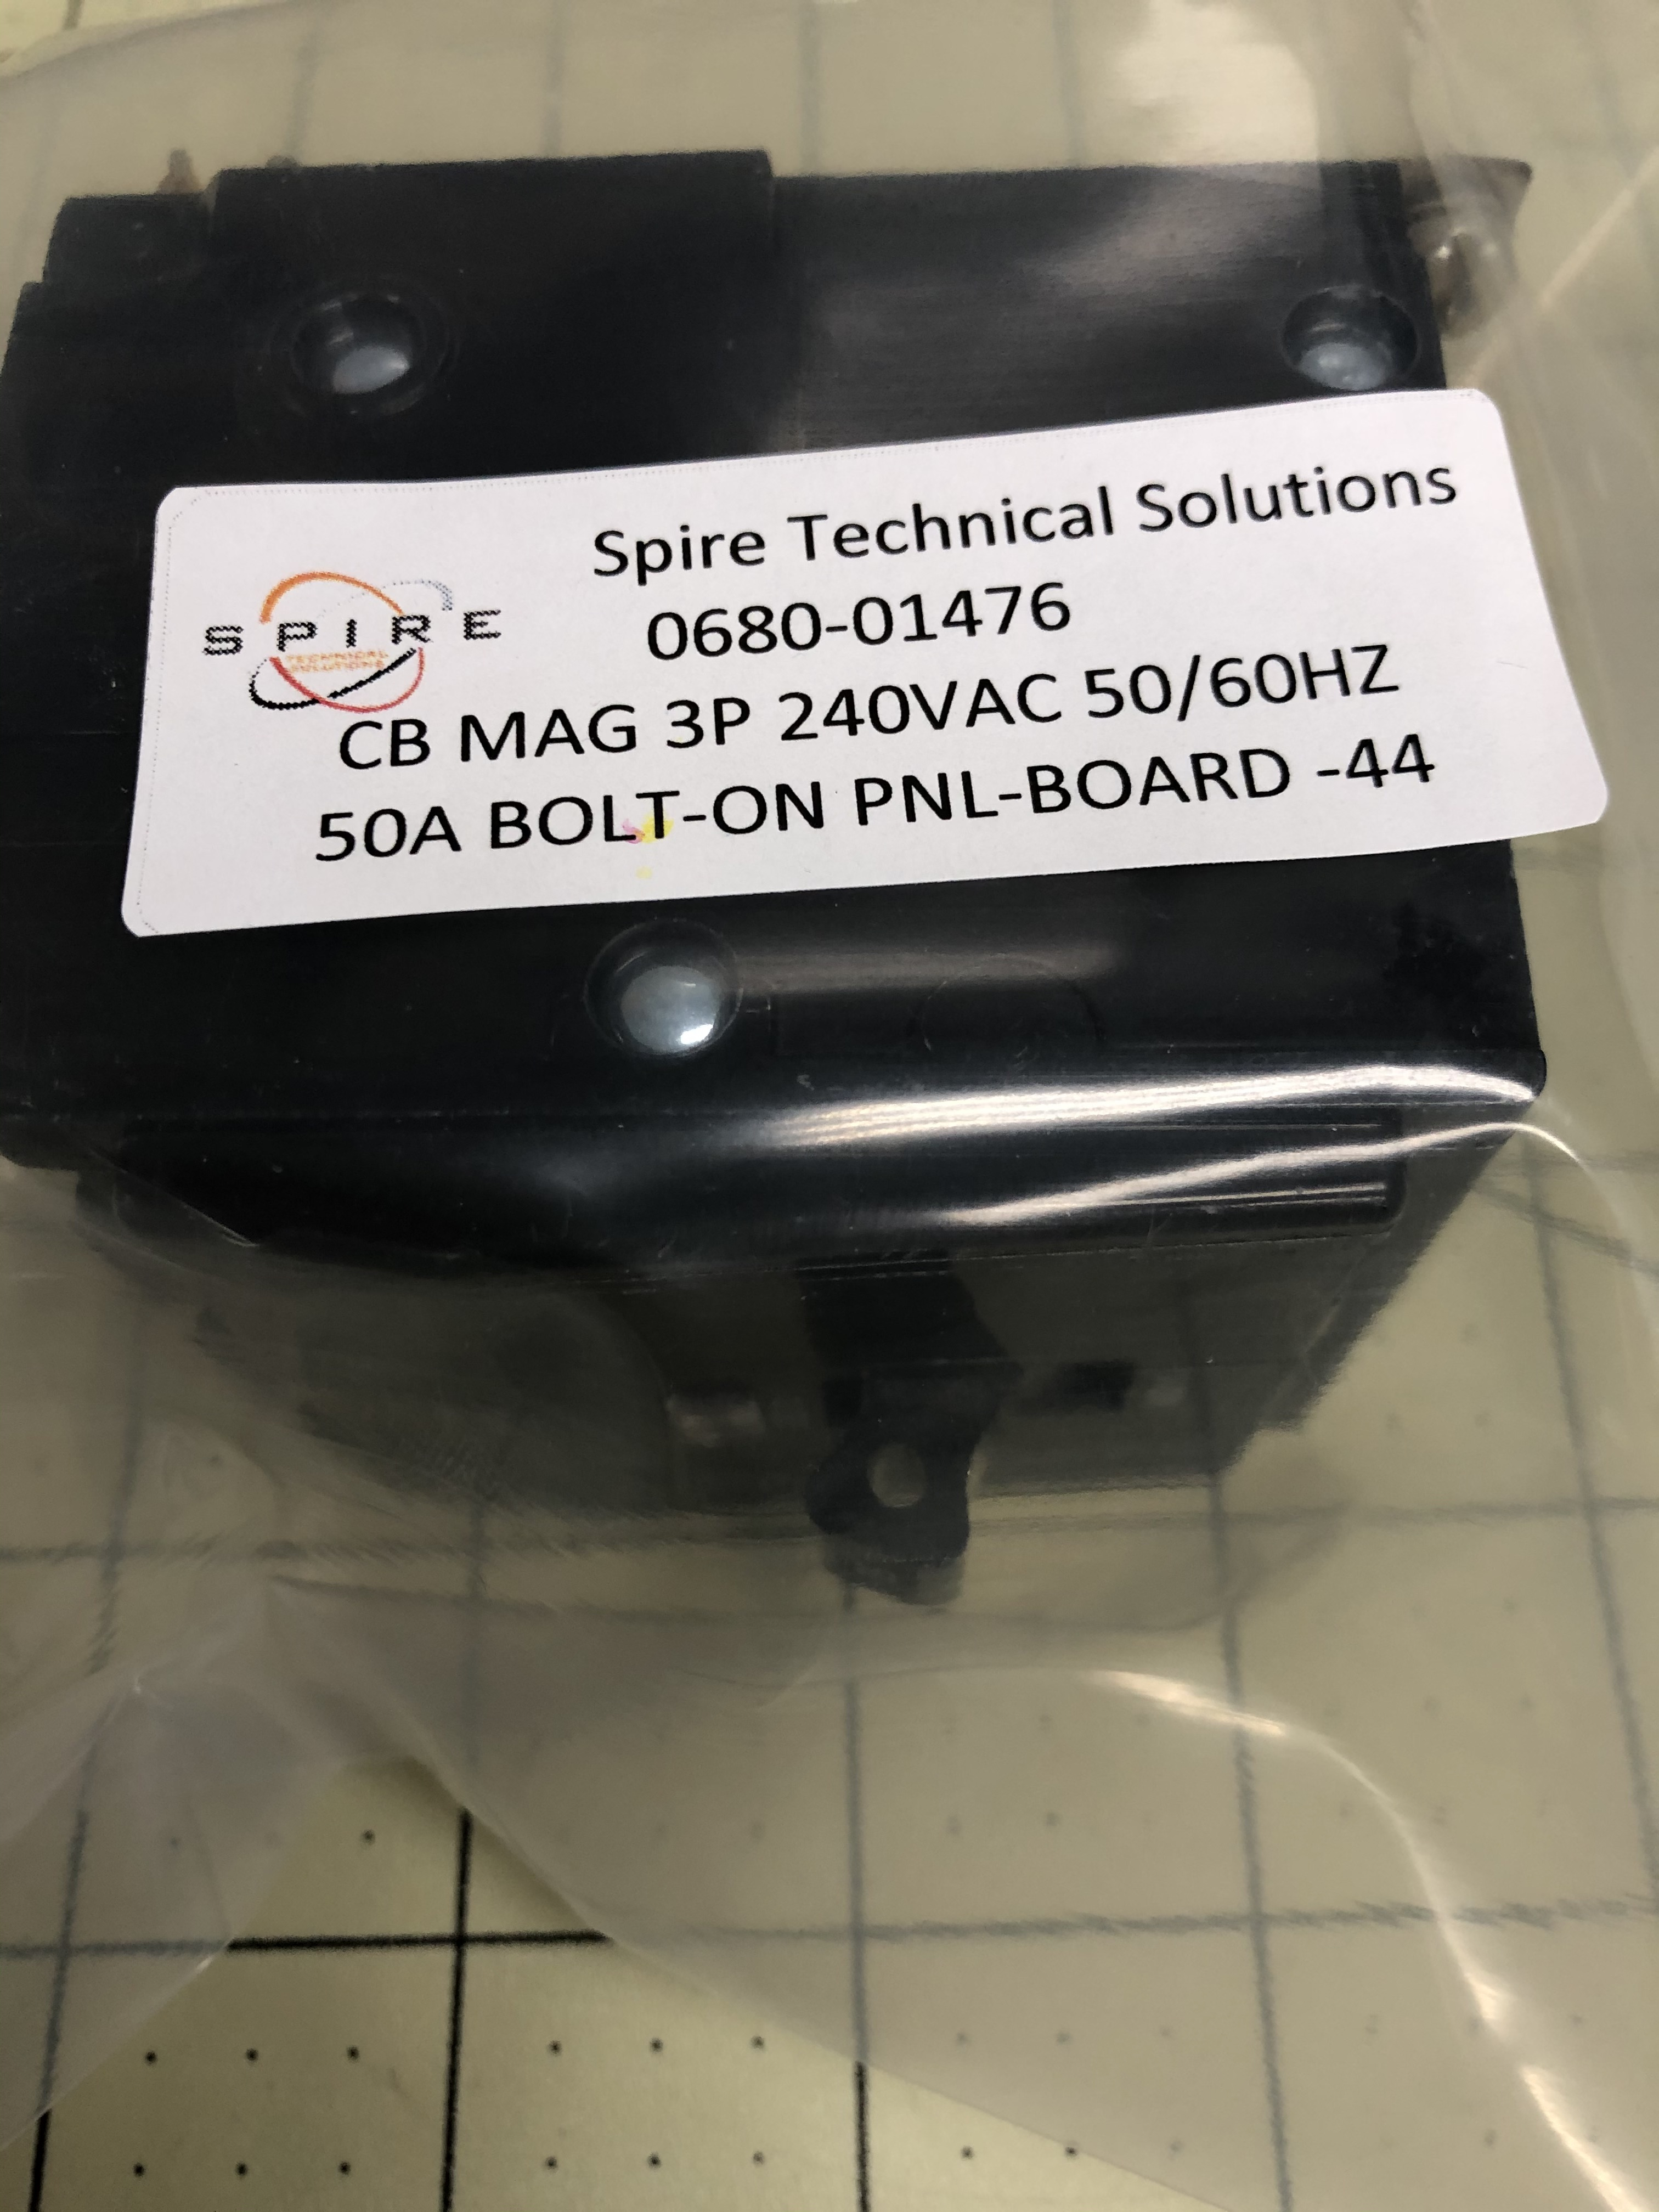 CB MAG 3P 240VAC 50A 50/60HZ BOLT-ON PNL-BOARD